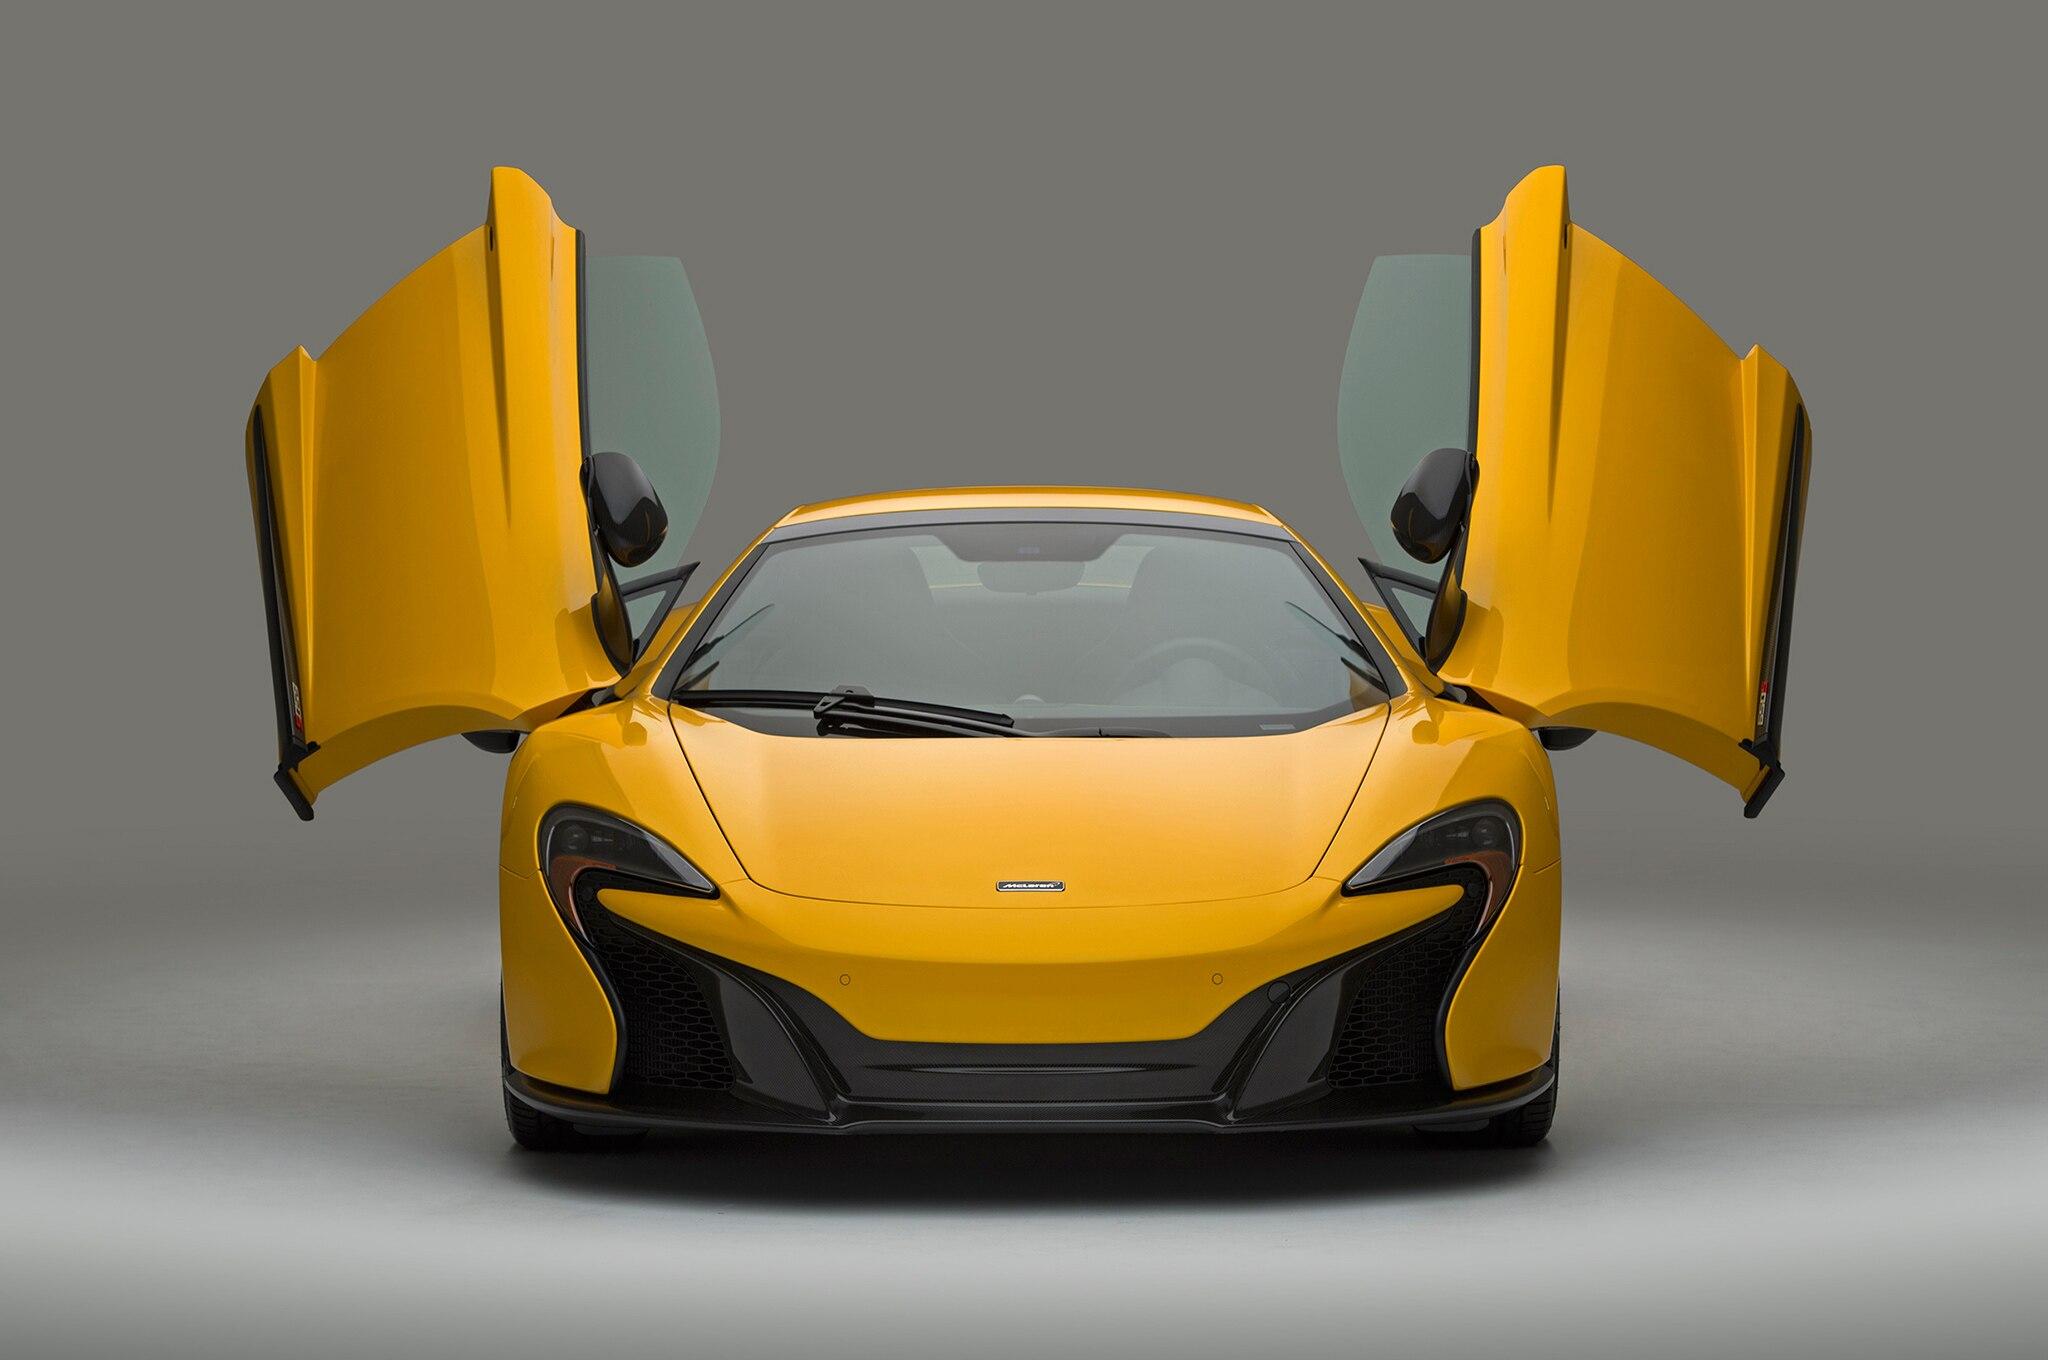 Conner Golden & 2016 McLaren 650S Receives More Standard Carbon-Fiber Trim pezcame.com